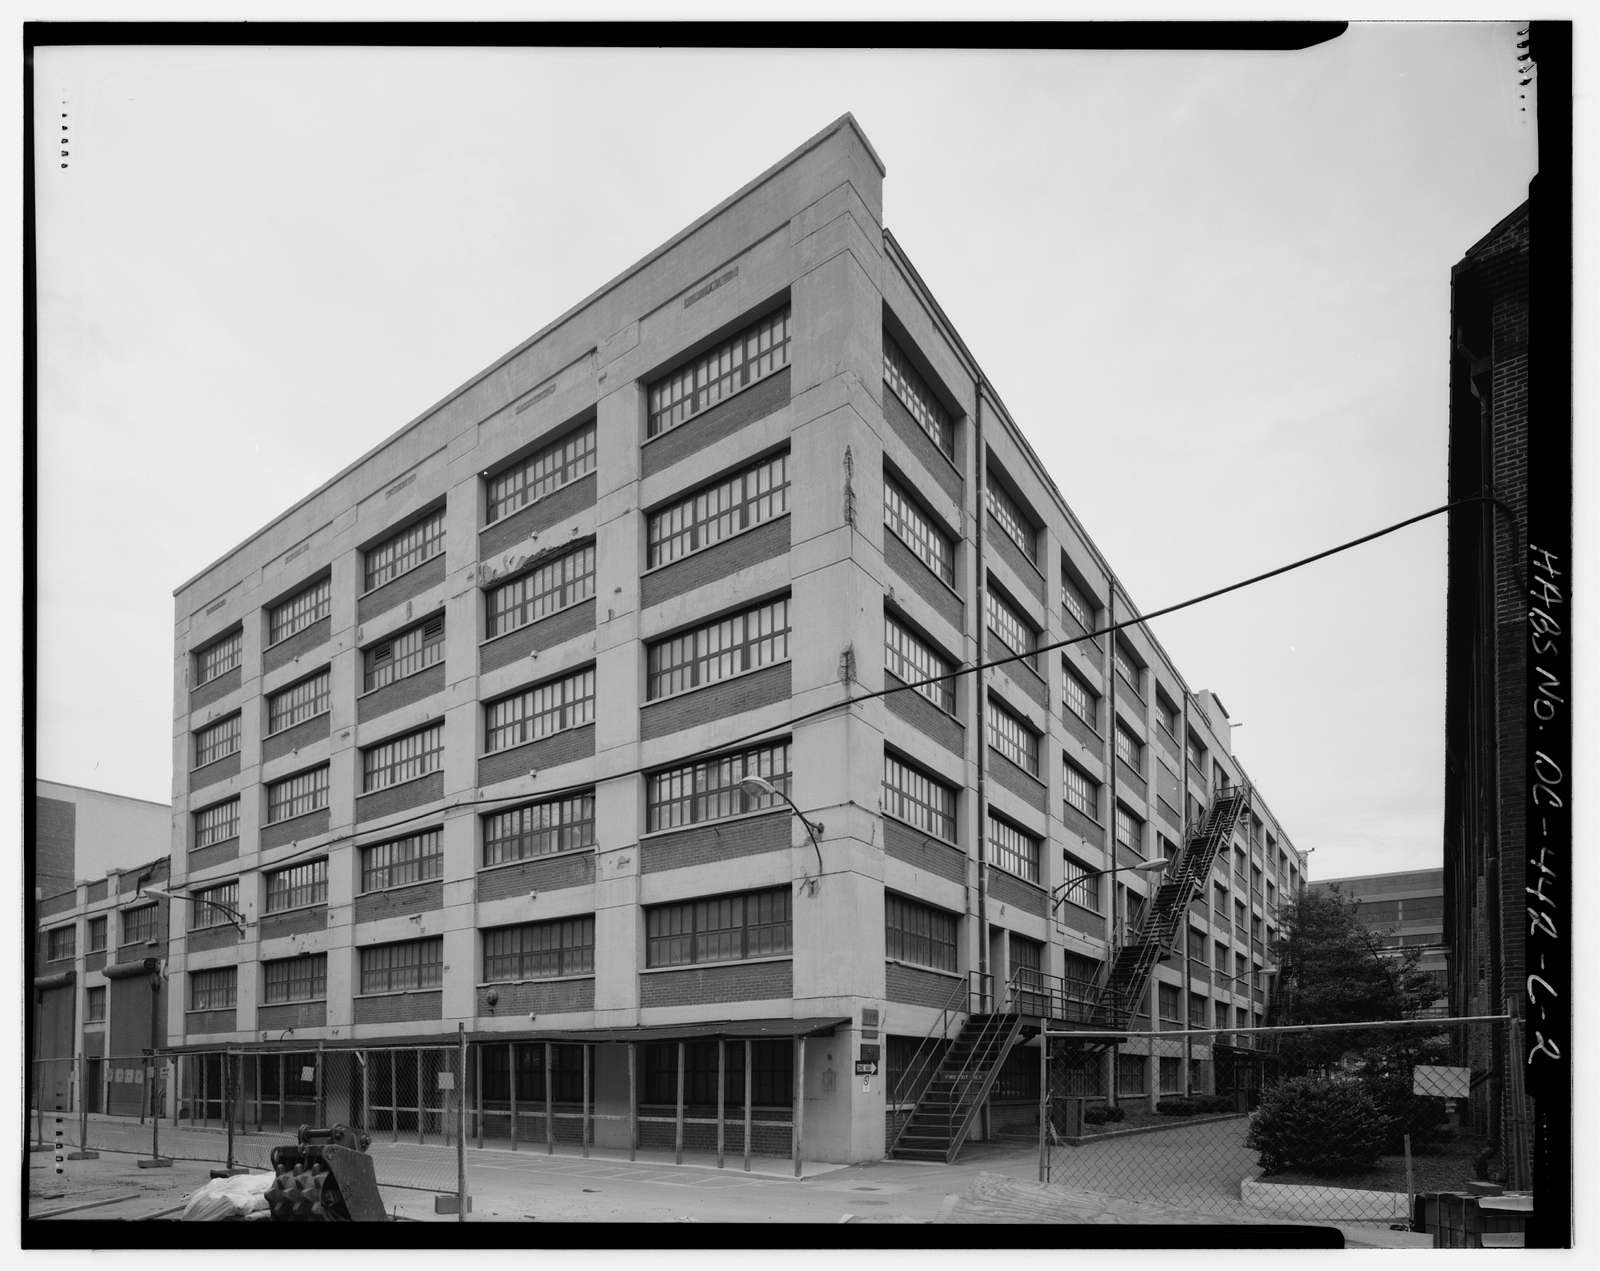 Navy Yard, Building No. 143, Between Isaac Hull & Patterson Avenues, Washington, District of Columbia, DC